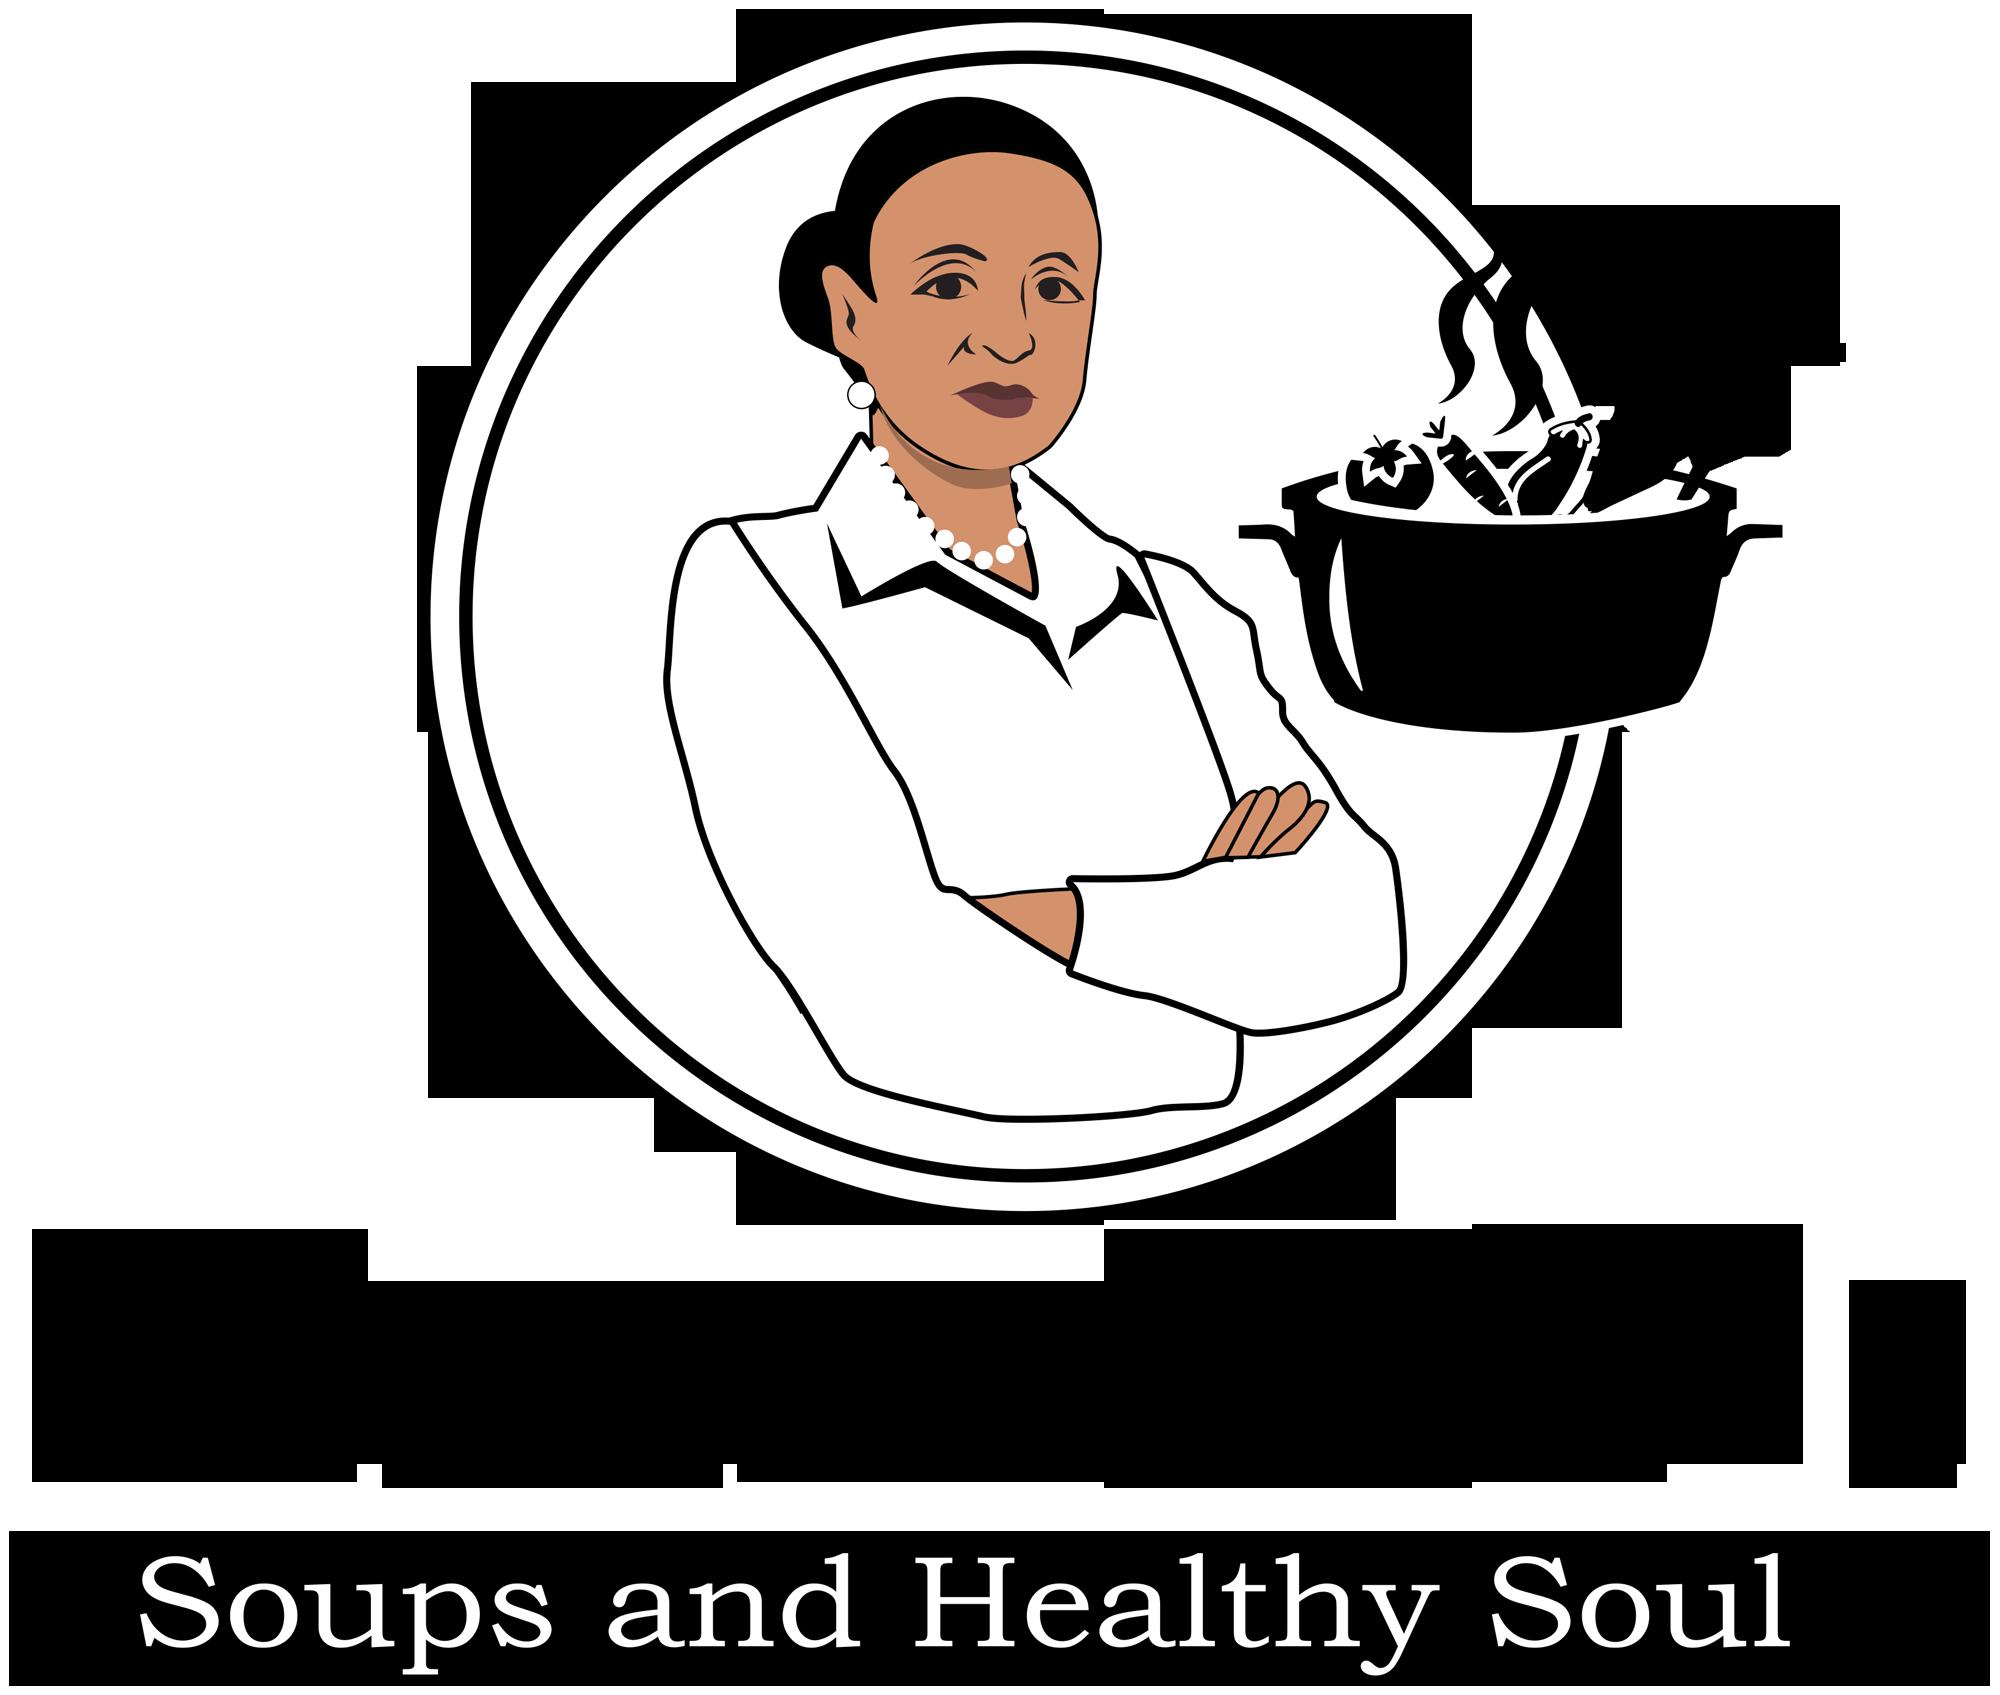 Soup clipart matzo ball soup. Healthy soul food gourmet